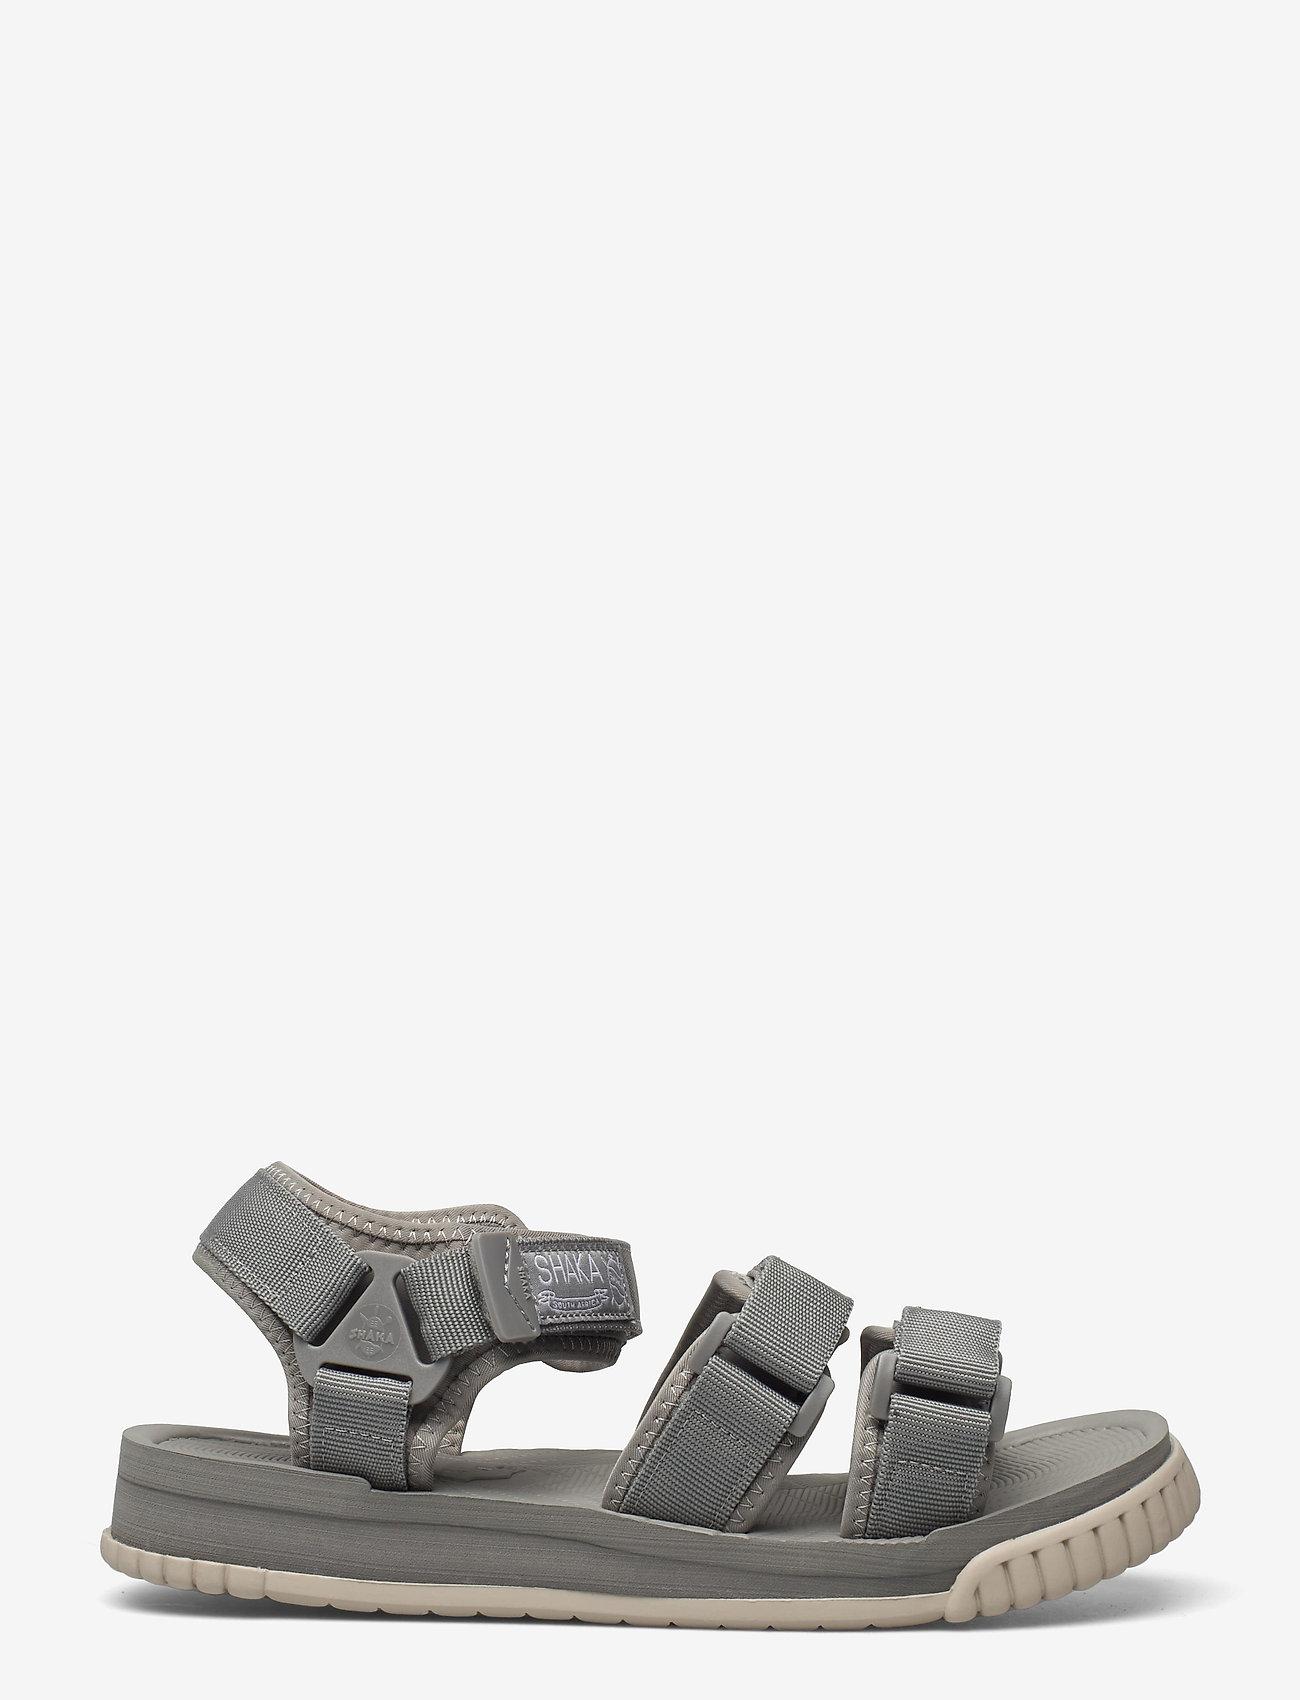 Shaka - Neo Bungy - platta sandaler - grey/grege - 1